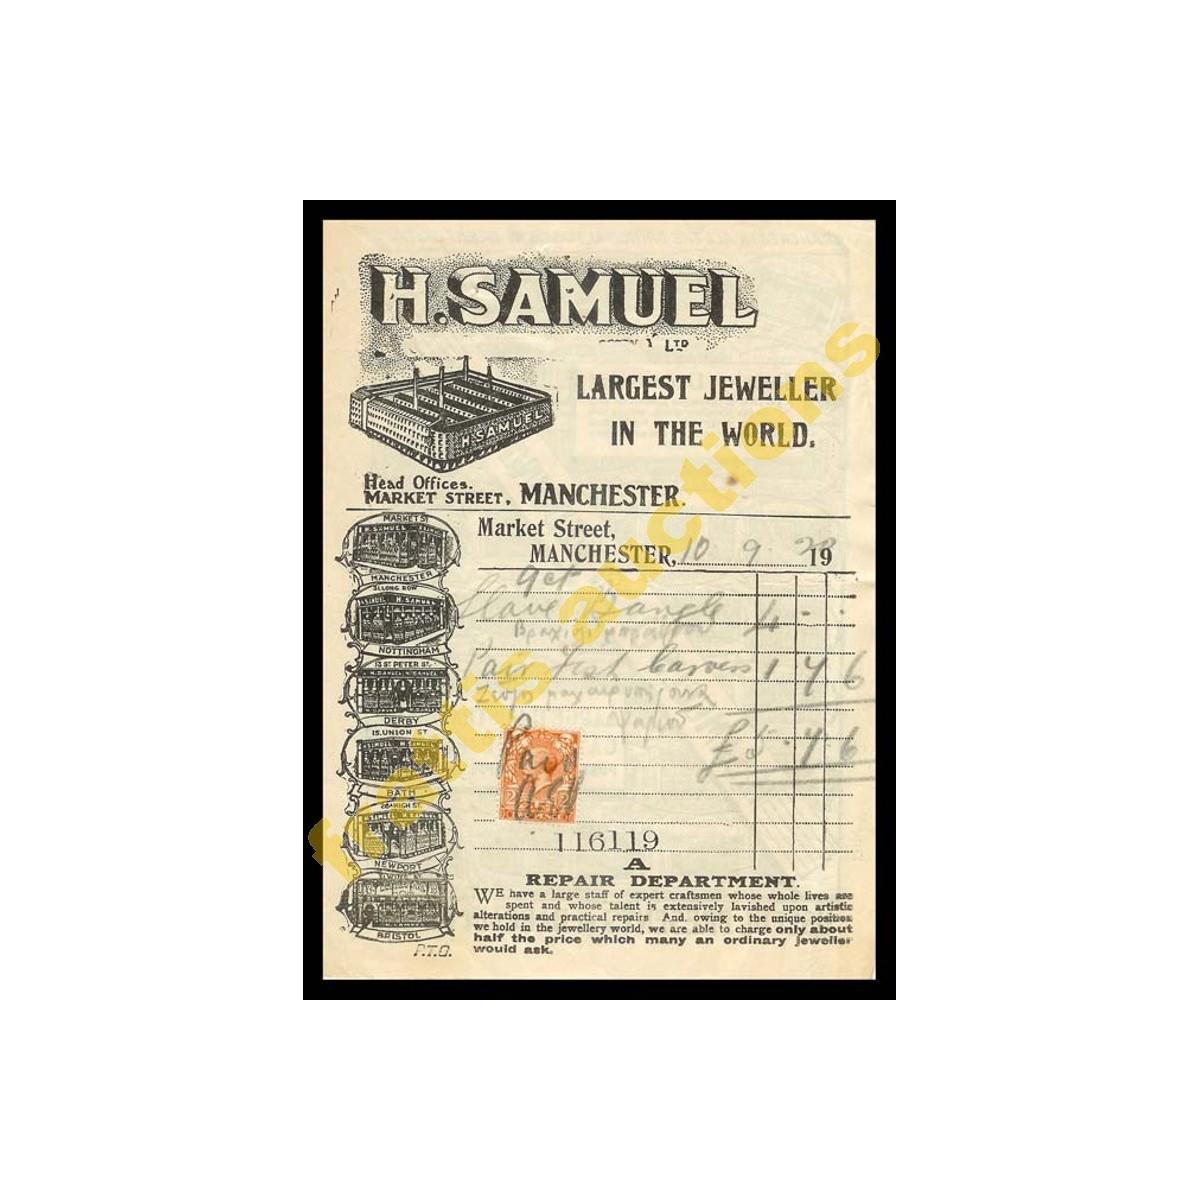 H.SAMUEL Κοσμηματοπωλεία, απόδειξη πληρωμής